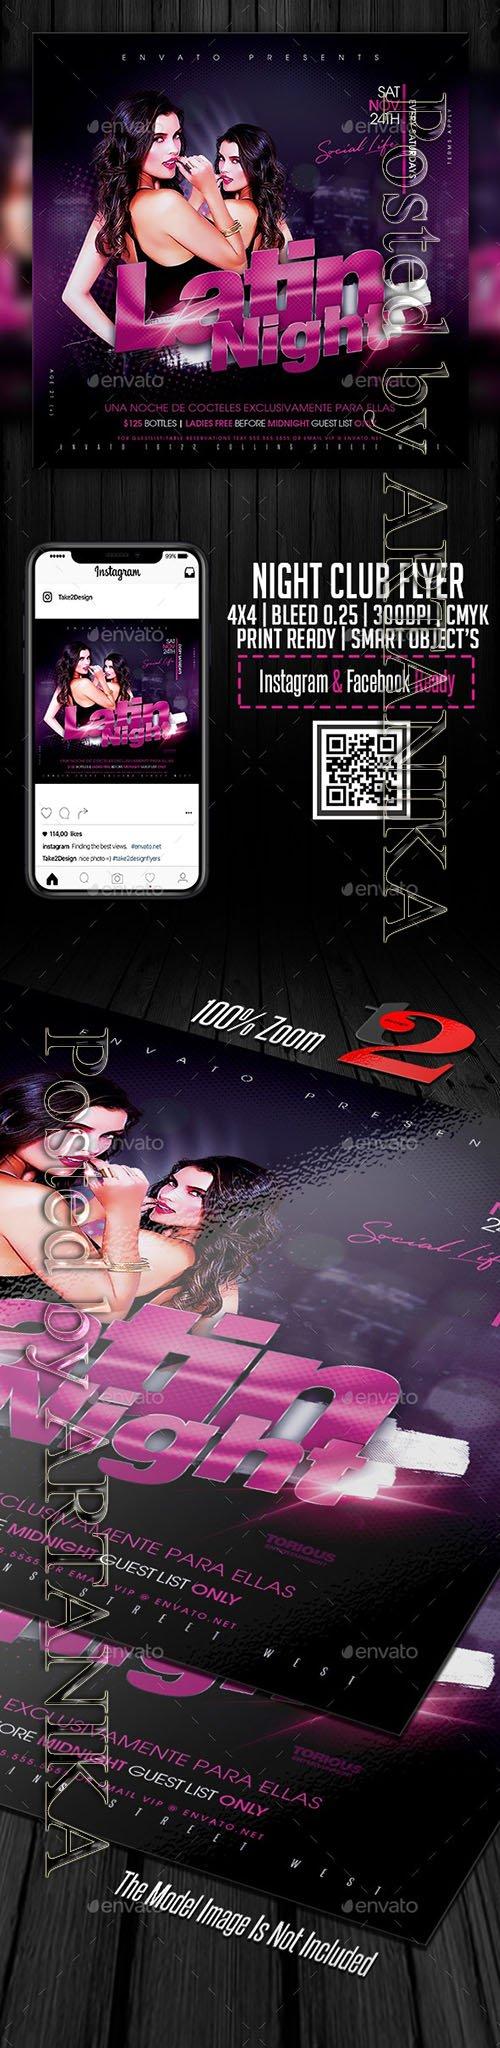 Night Club Flyer Template 23515134